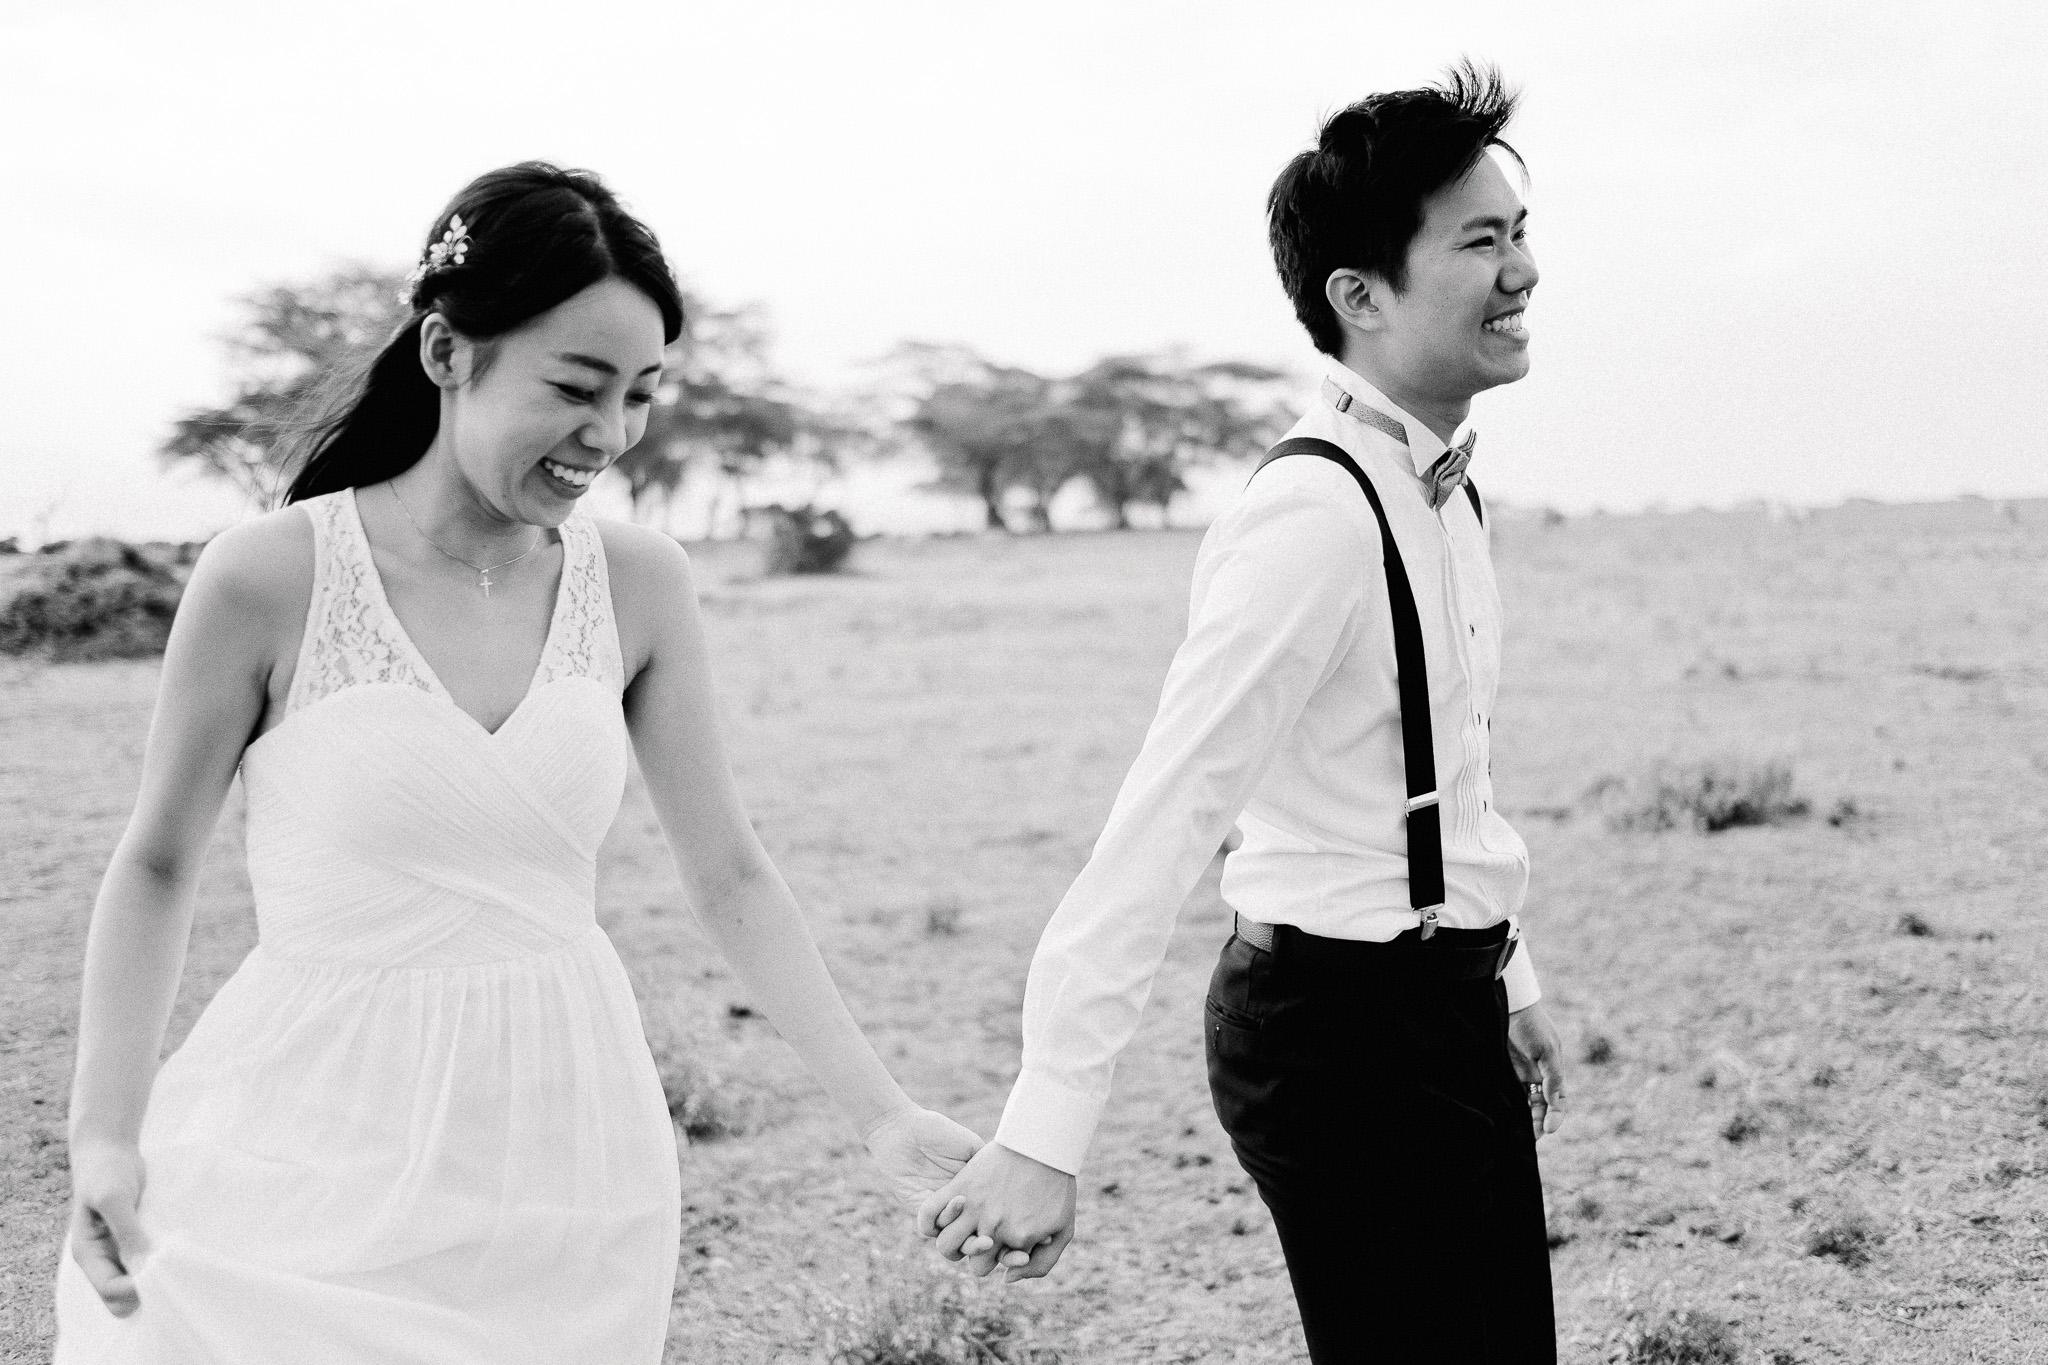 Anna-Hari-Photography-Safari-Elopement-Kenya-Wedding-Photographer-Kenya-35.jpg